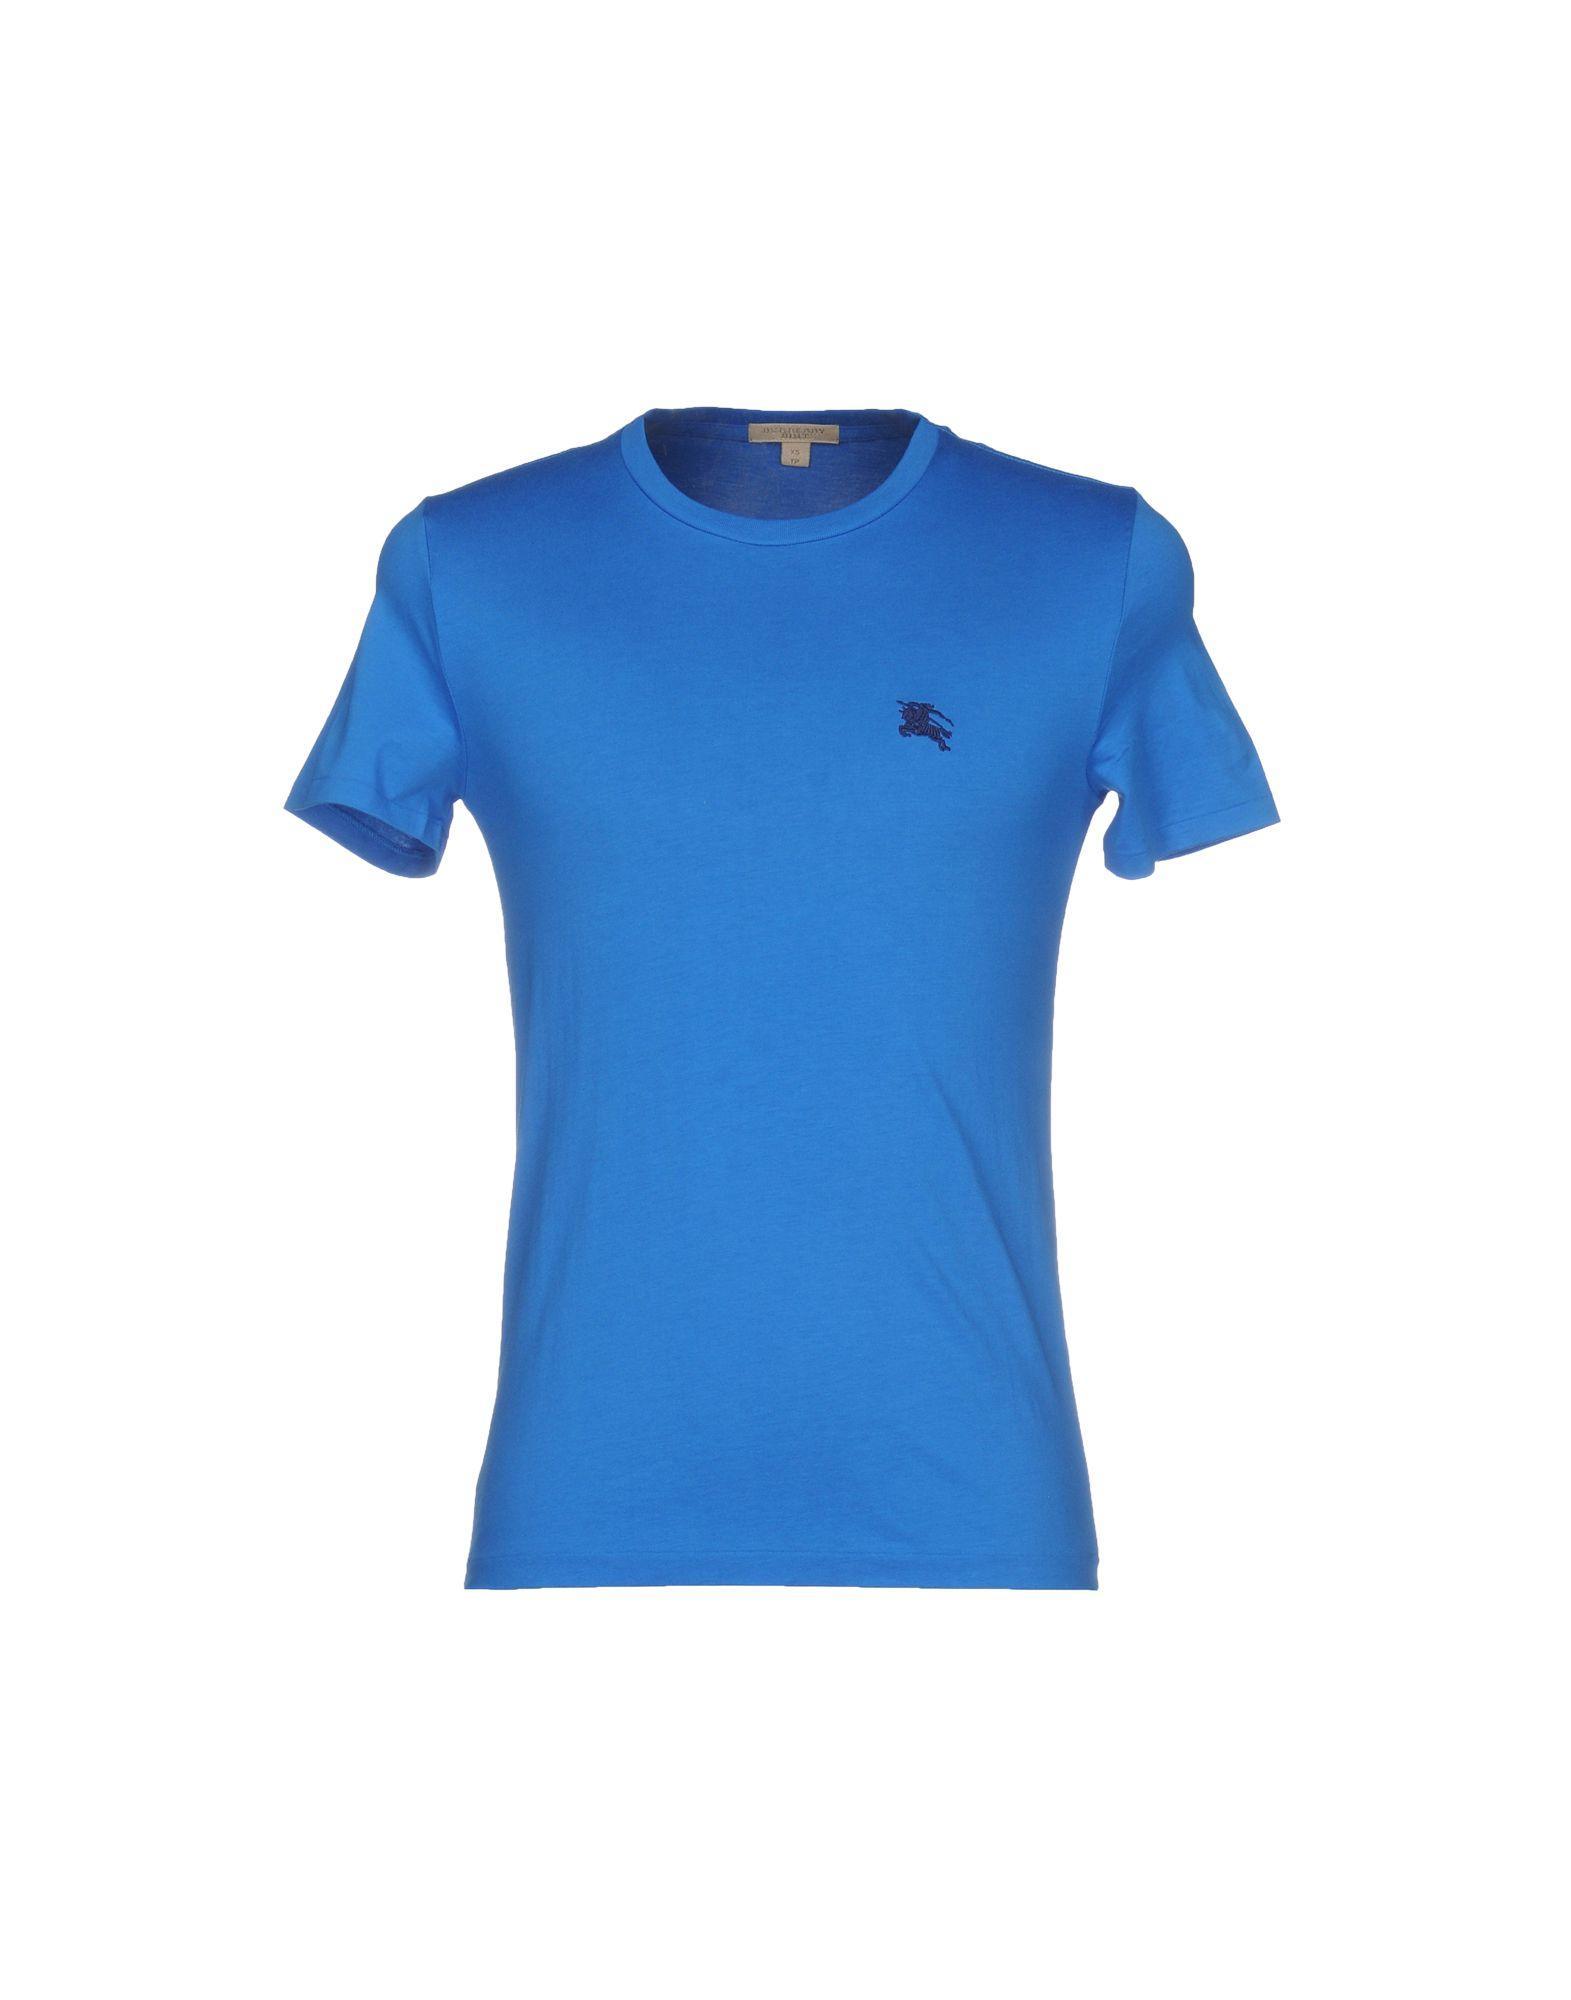 Lyst burberry t shirt in blue for men for T shirt burberry men